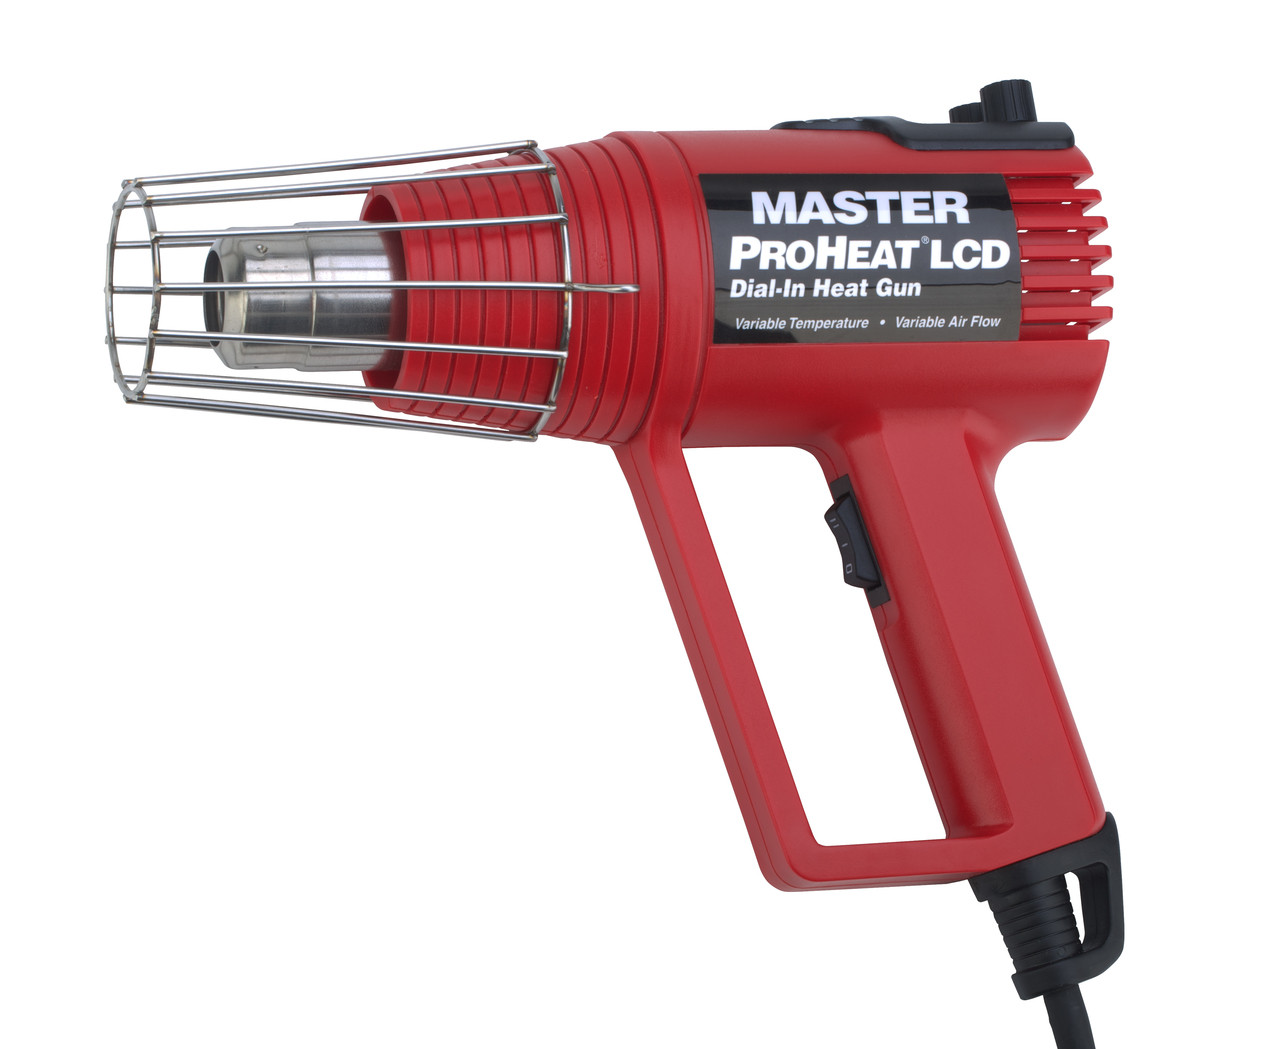 Professional Variable Temperature Digital Heat Gun